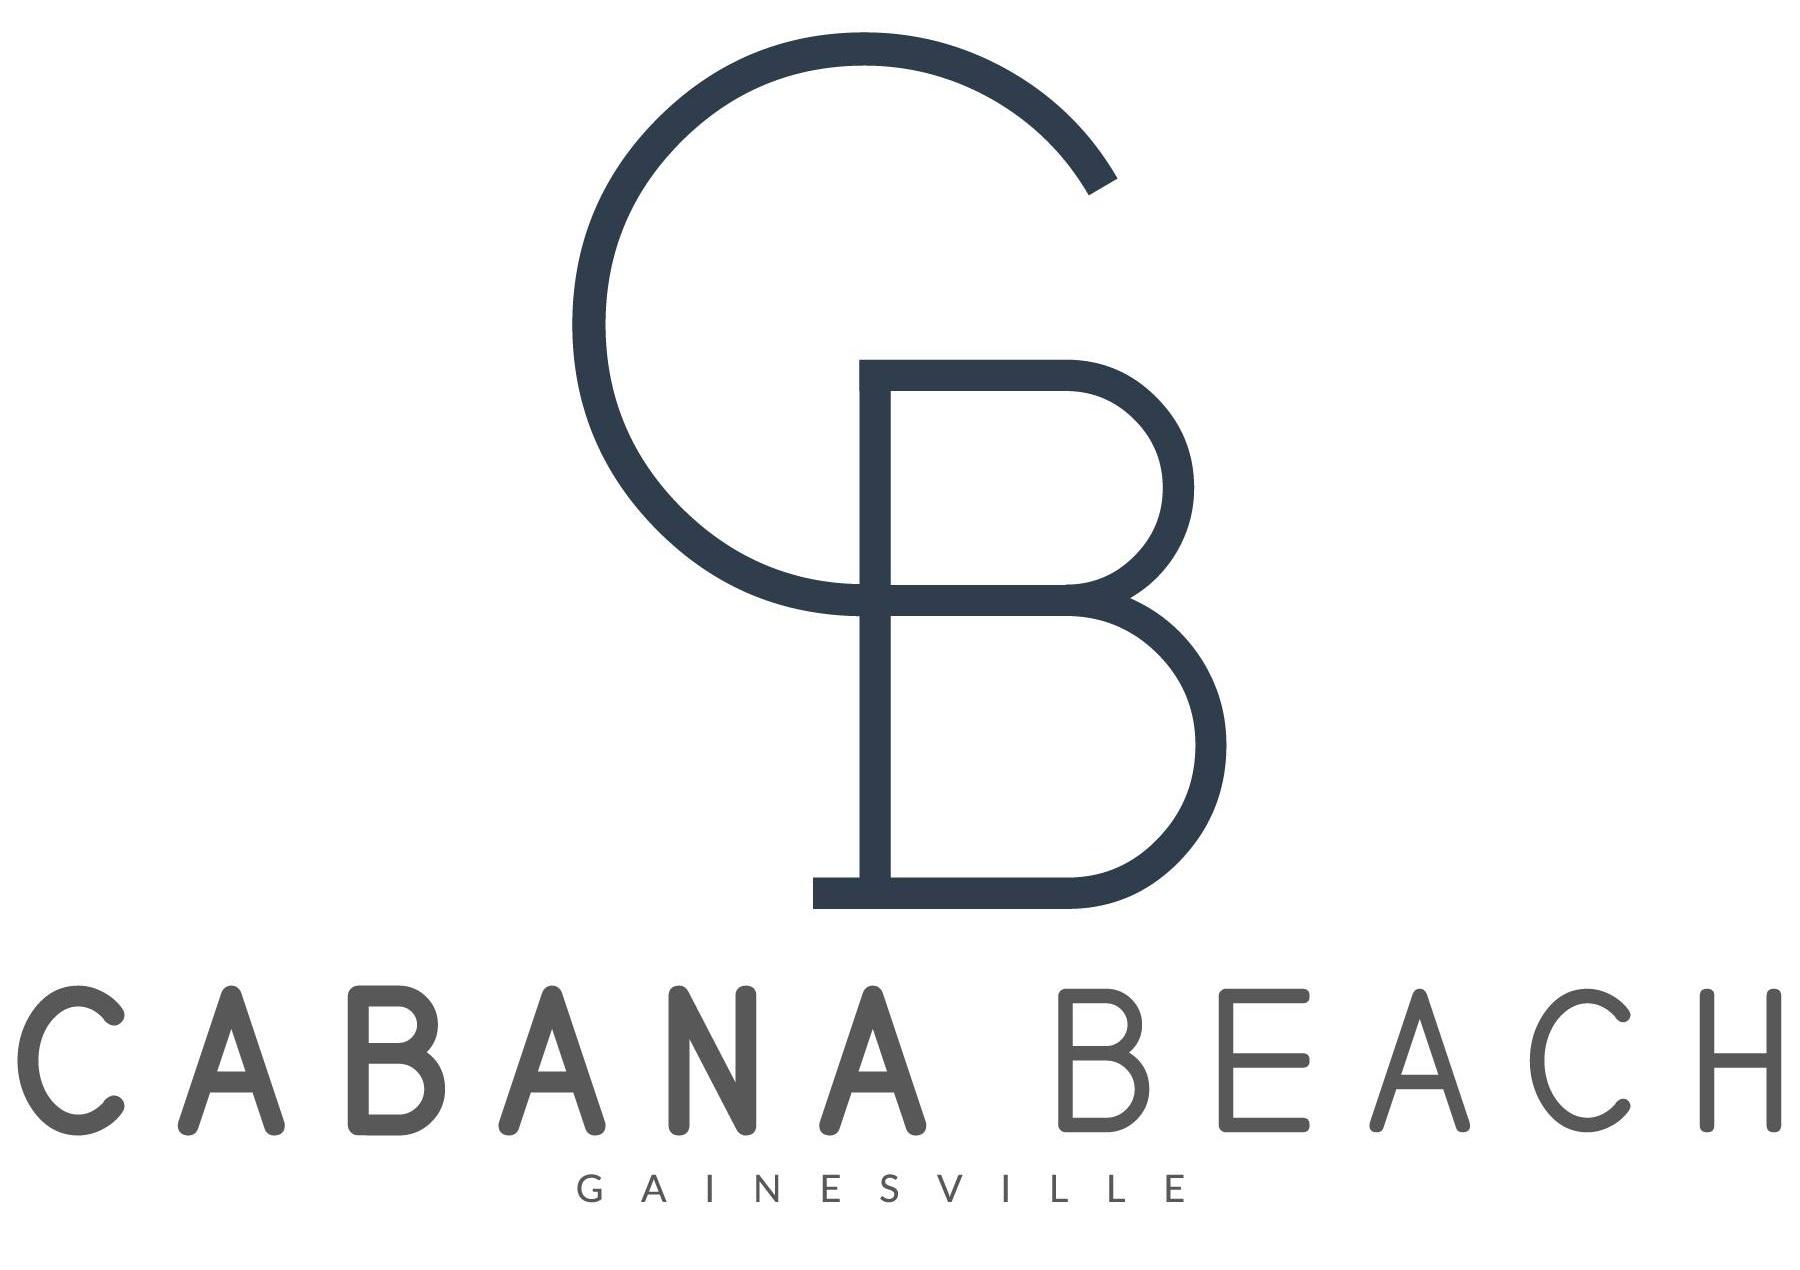 - www.cbgainesville.com